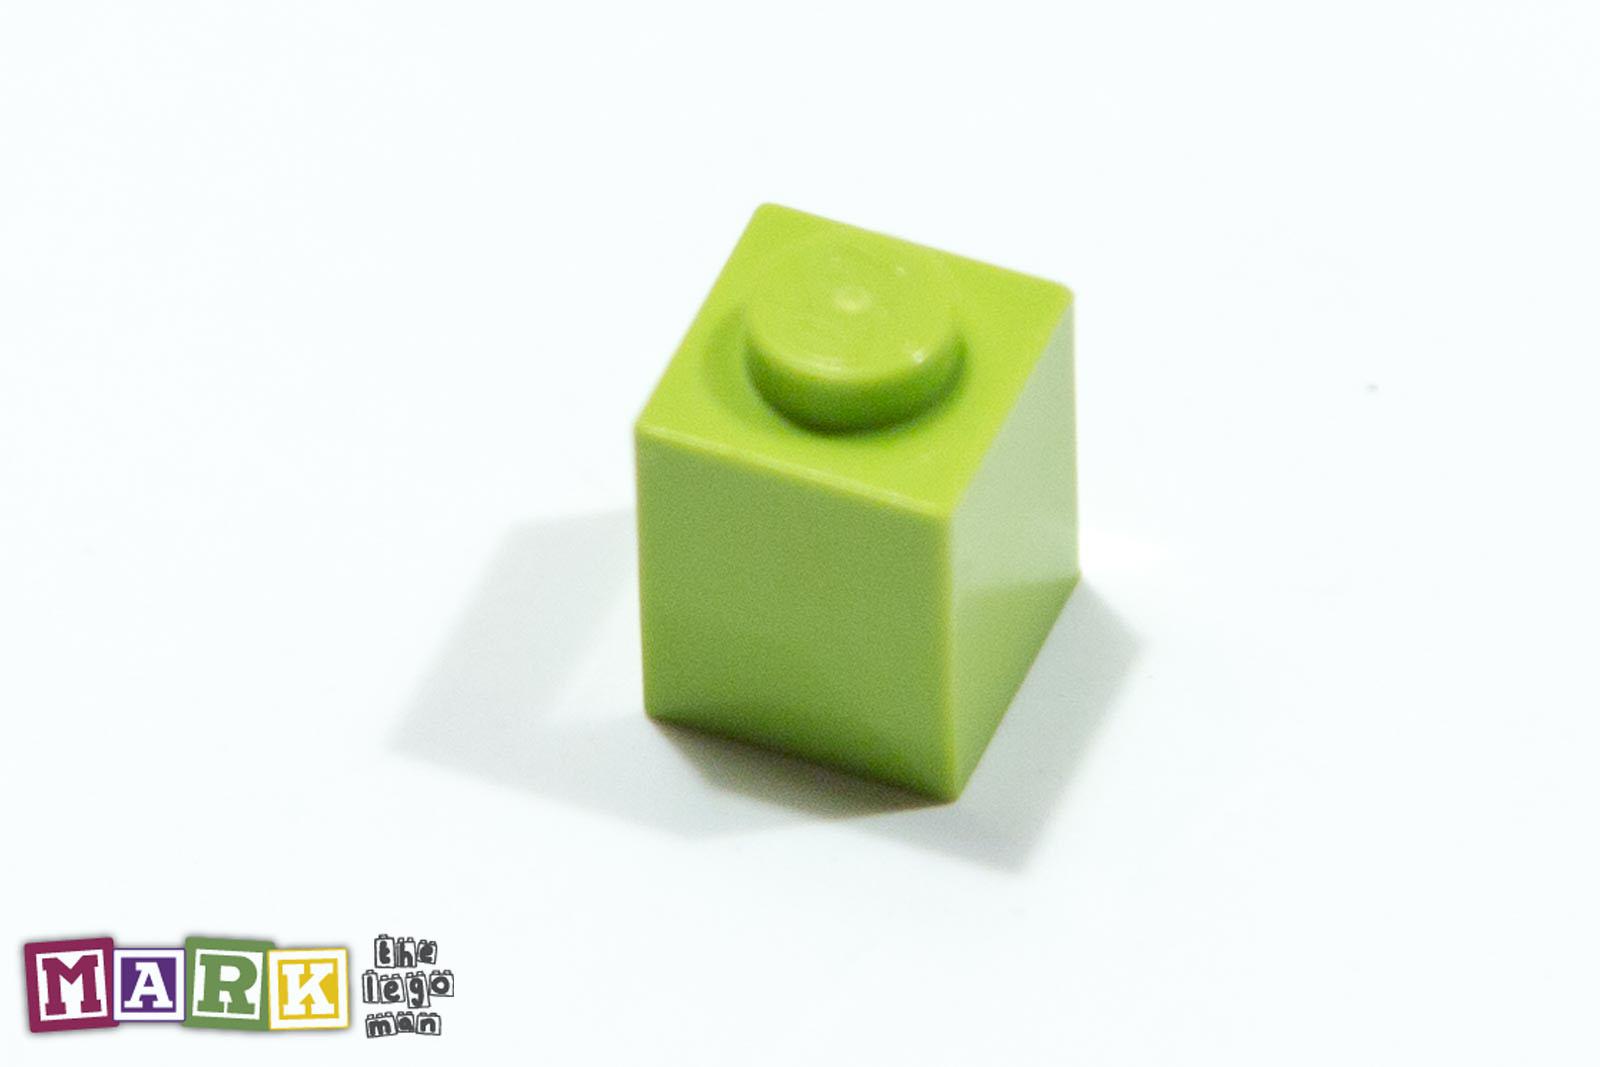 4220634 3005 Bright Yellow Green 1x1 Brick